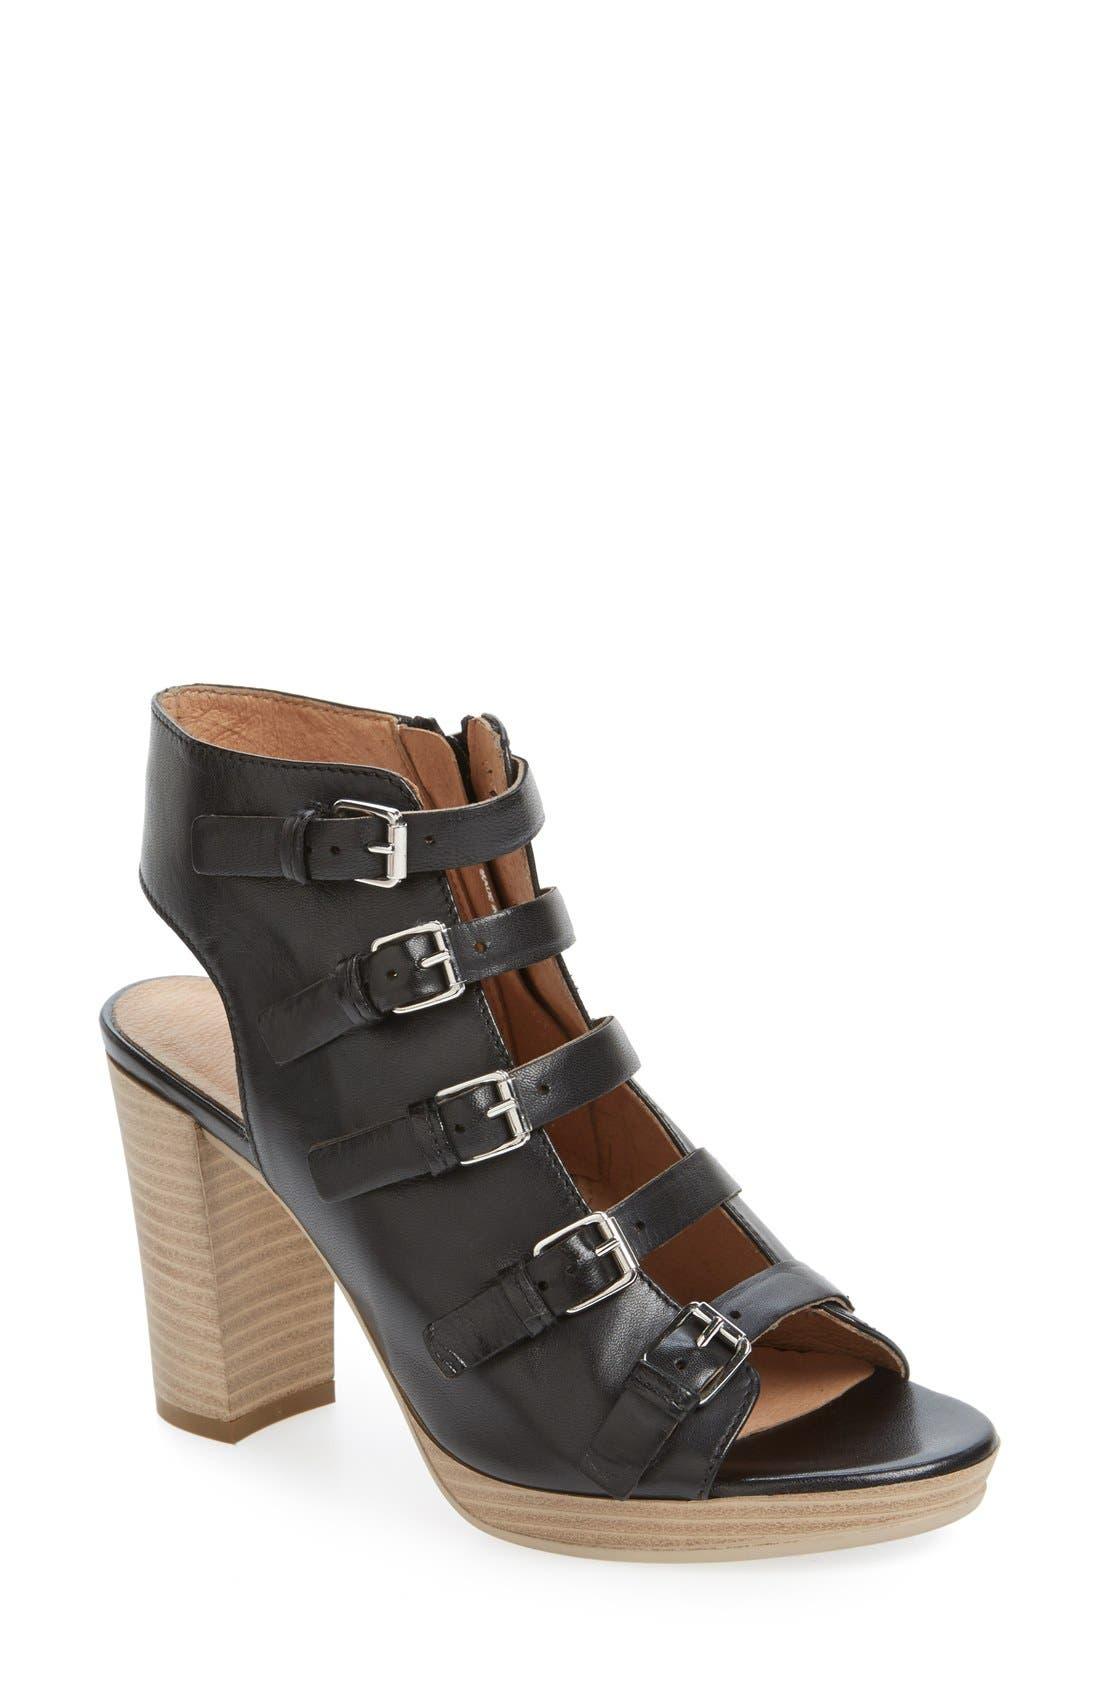 Kenneth Cole New York 'Kennedy' Buckle Strap Block Heel Sandal (Women)